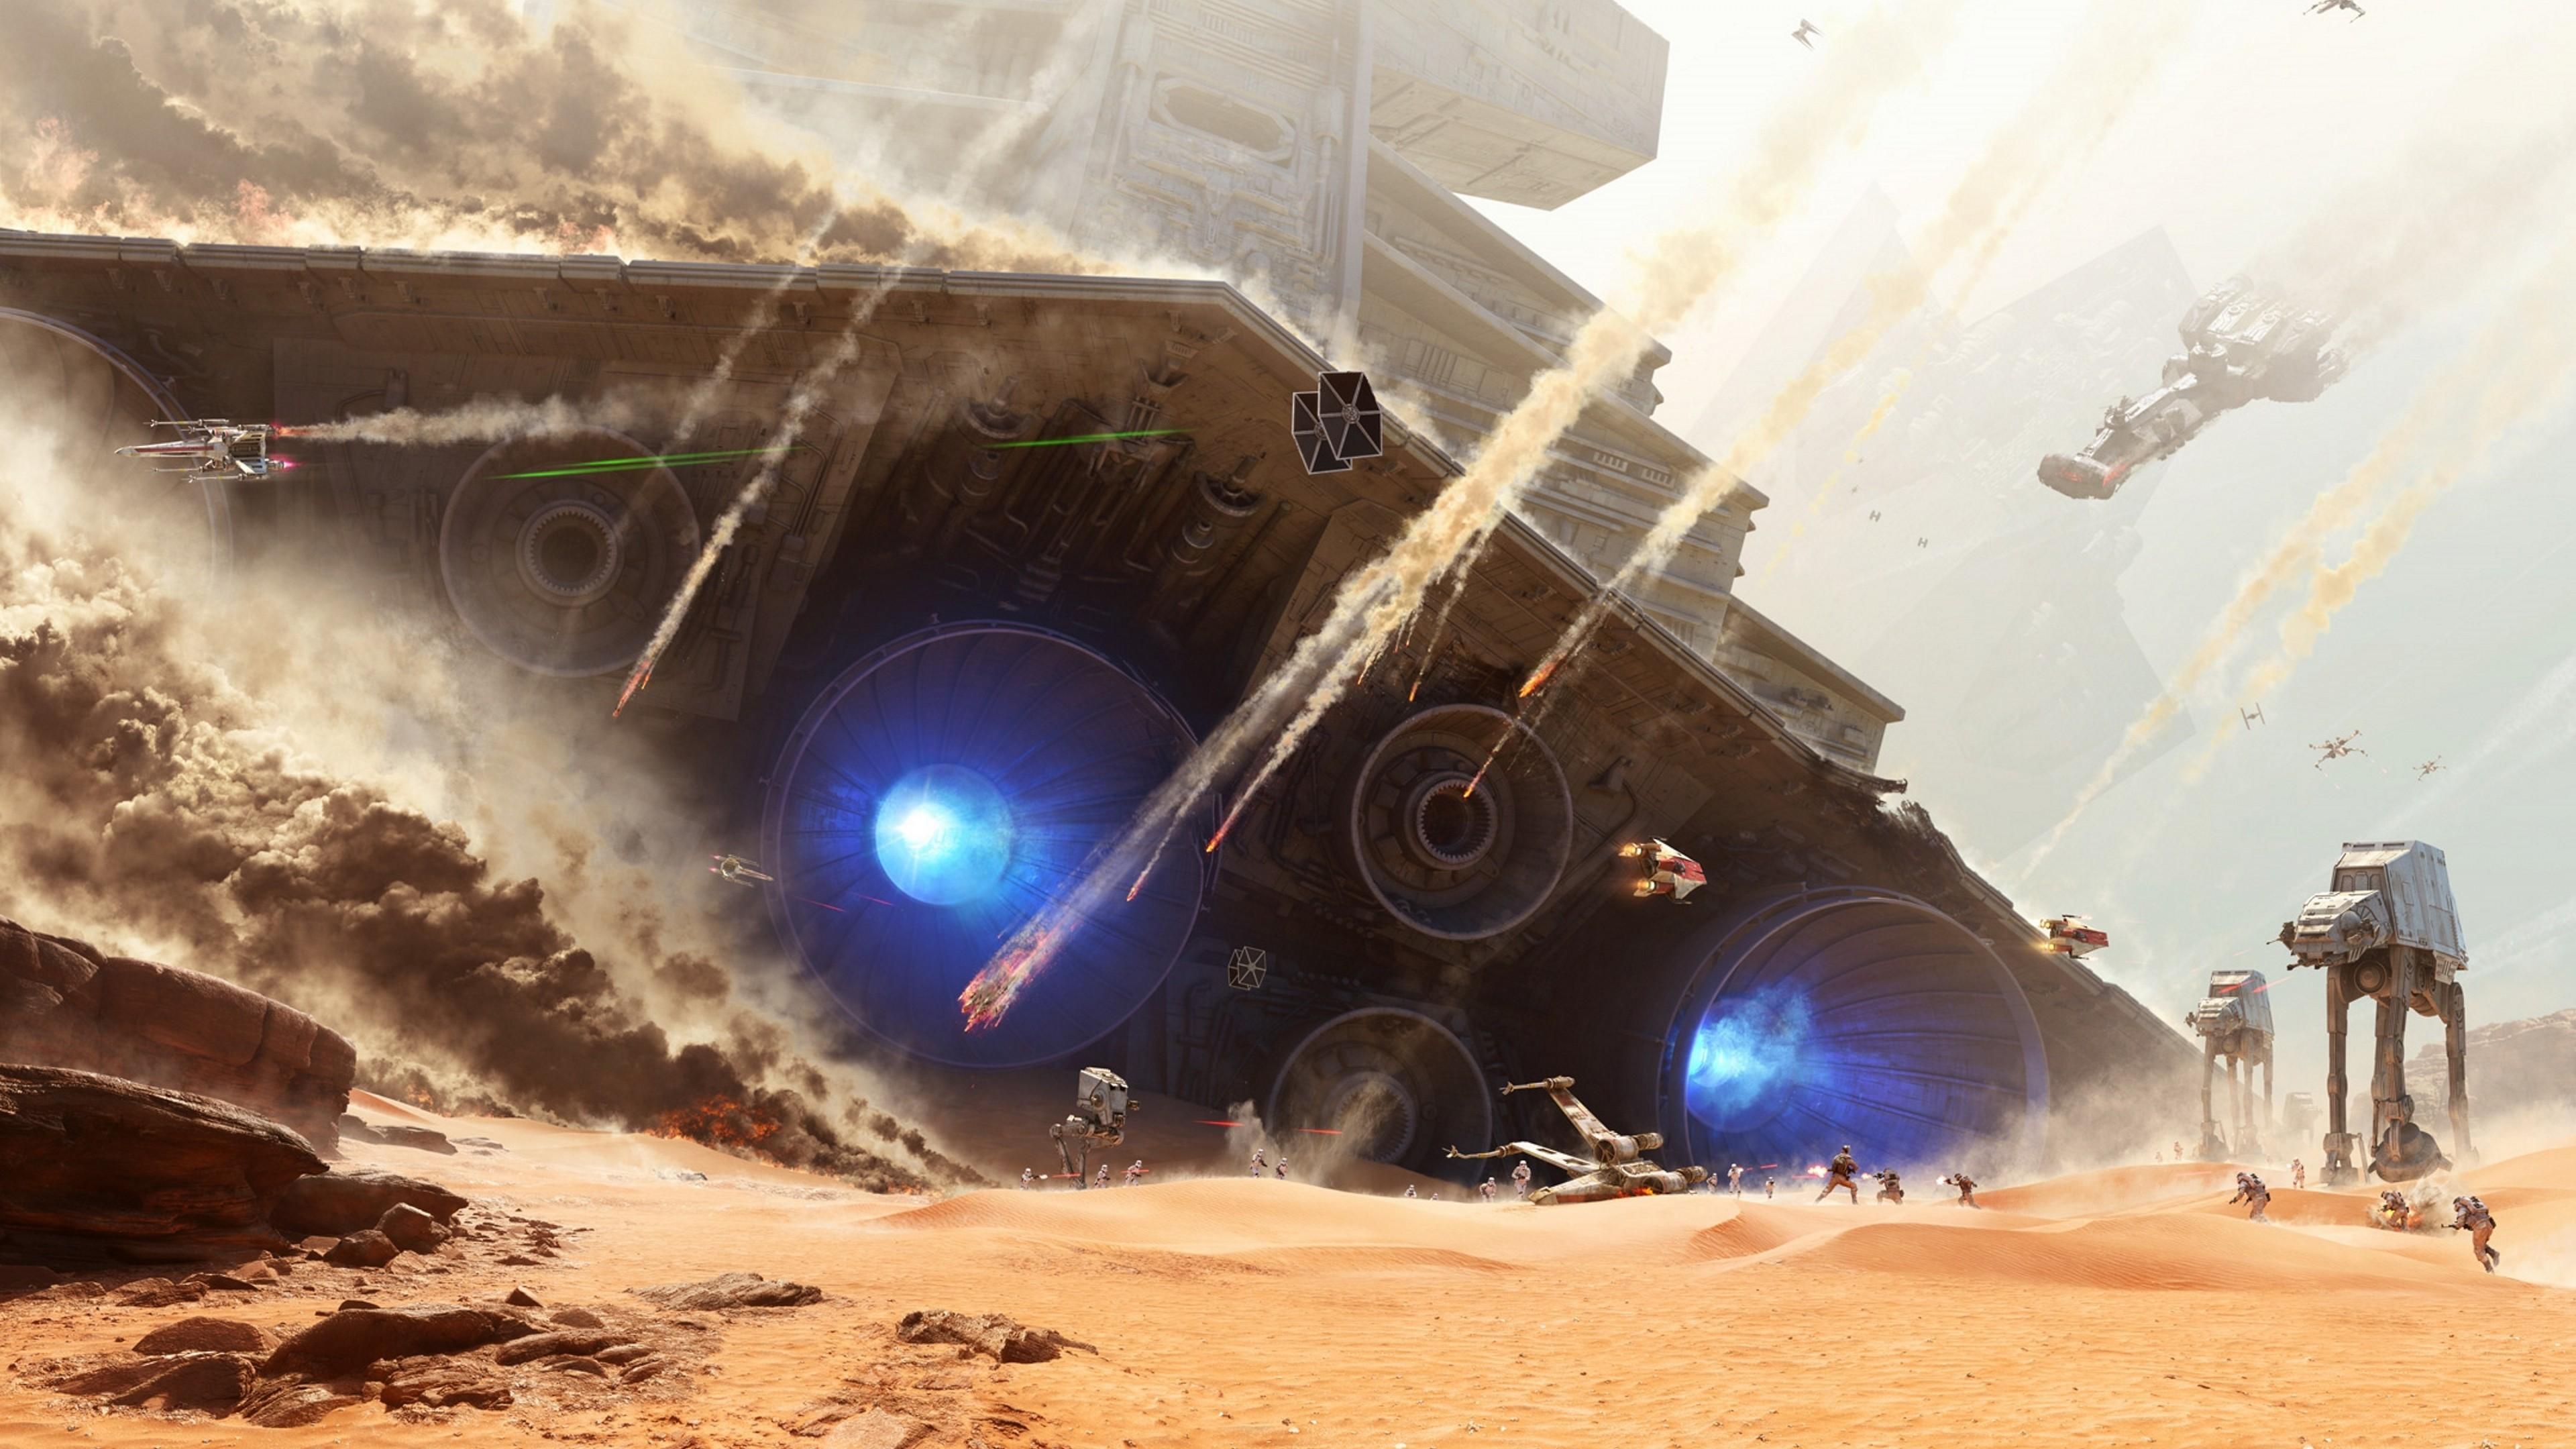 tie fighter wallpaper 5760×1080 – photo #14. #soldier, #Star Wars, #Star  Wars: Battlefront, #EA DICE, # .